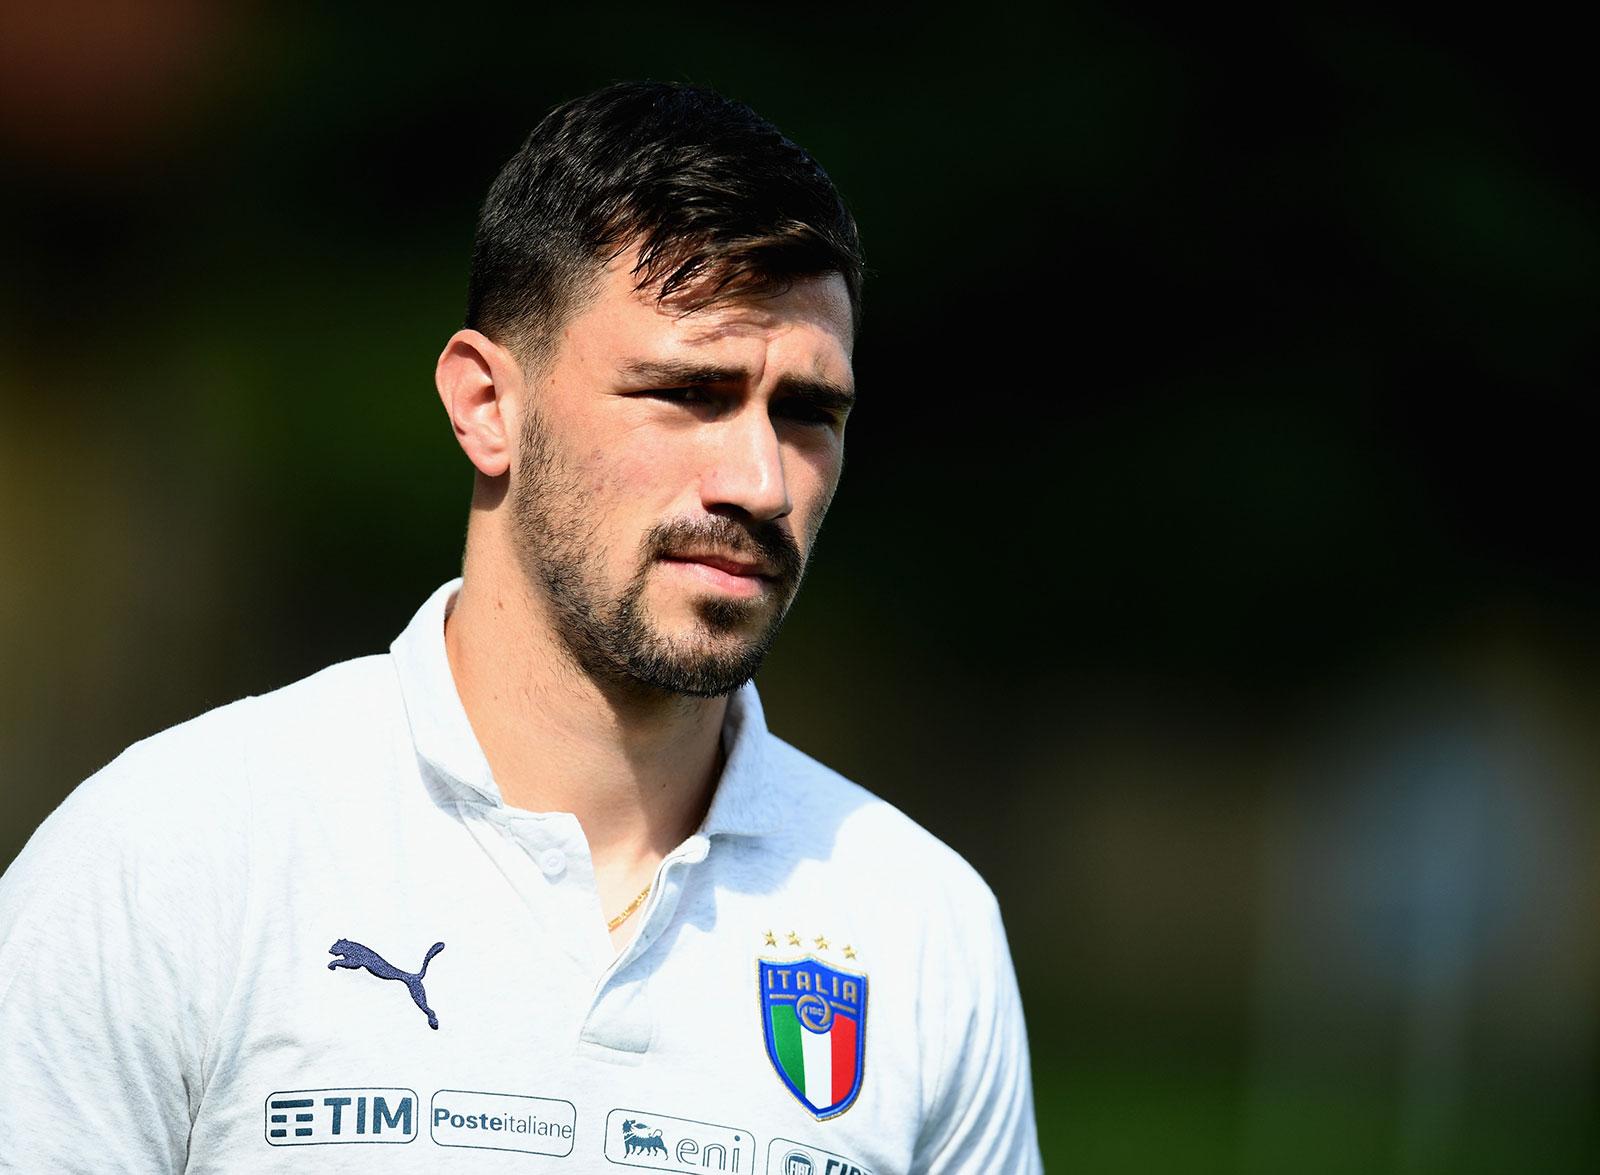 Alessio Romagnoli before Italy training session at Centro Tecnico Federale di Coverciano on May 26, 2018. (Photo by Claudio Villa/Getty Images)